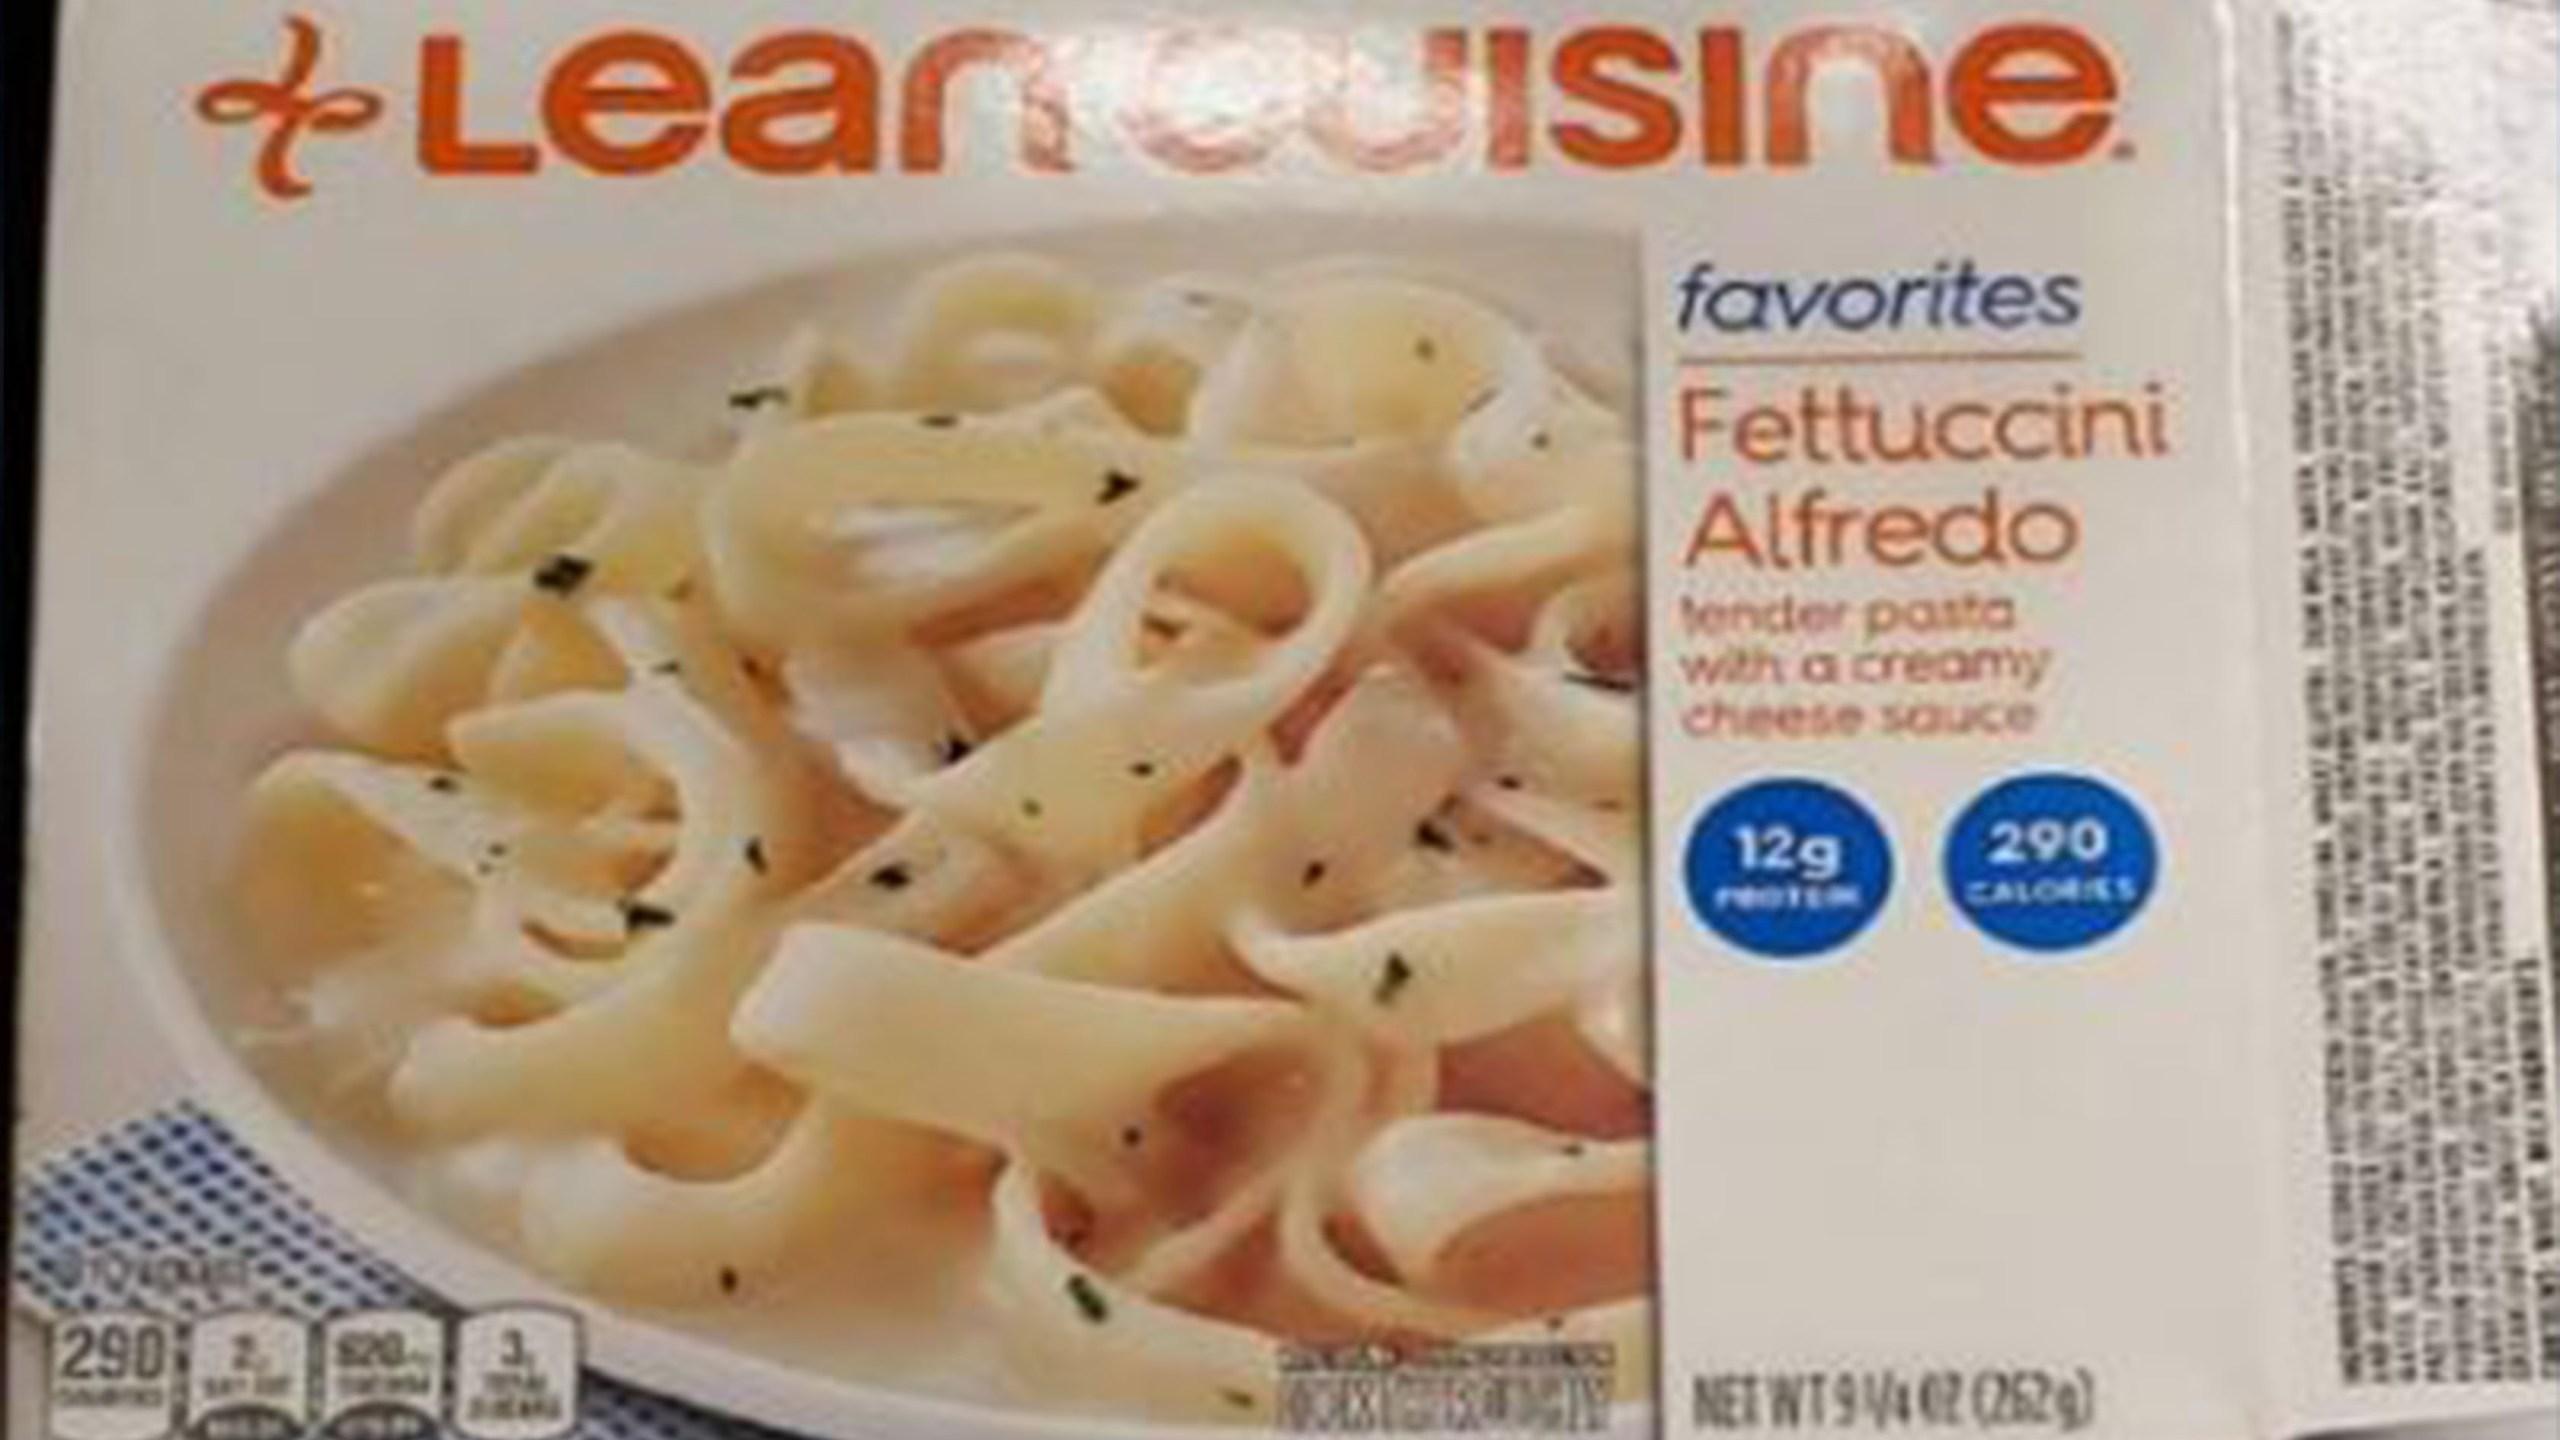 Lean Cuisine recall web